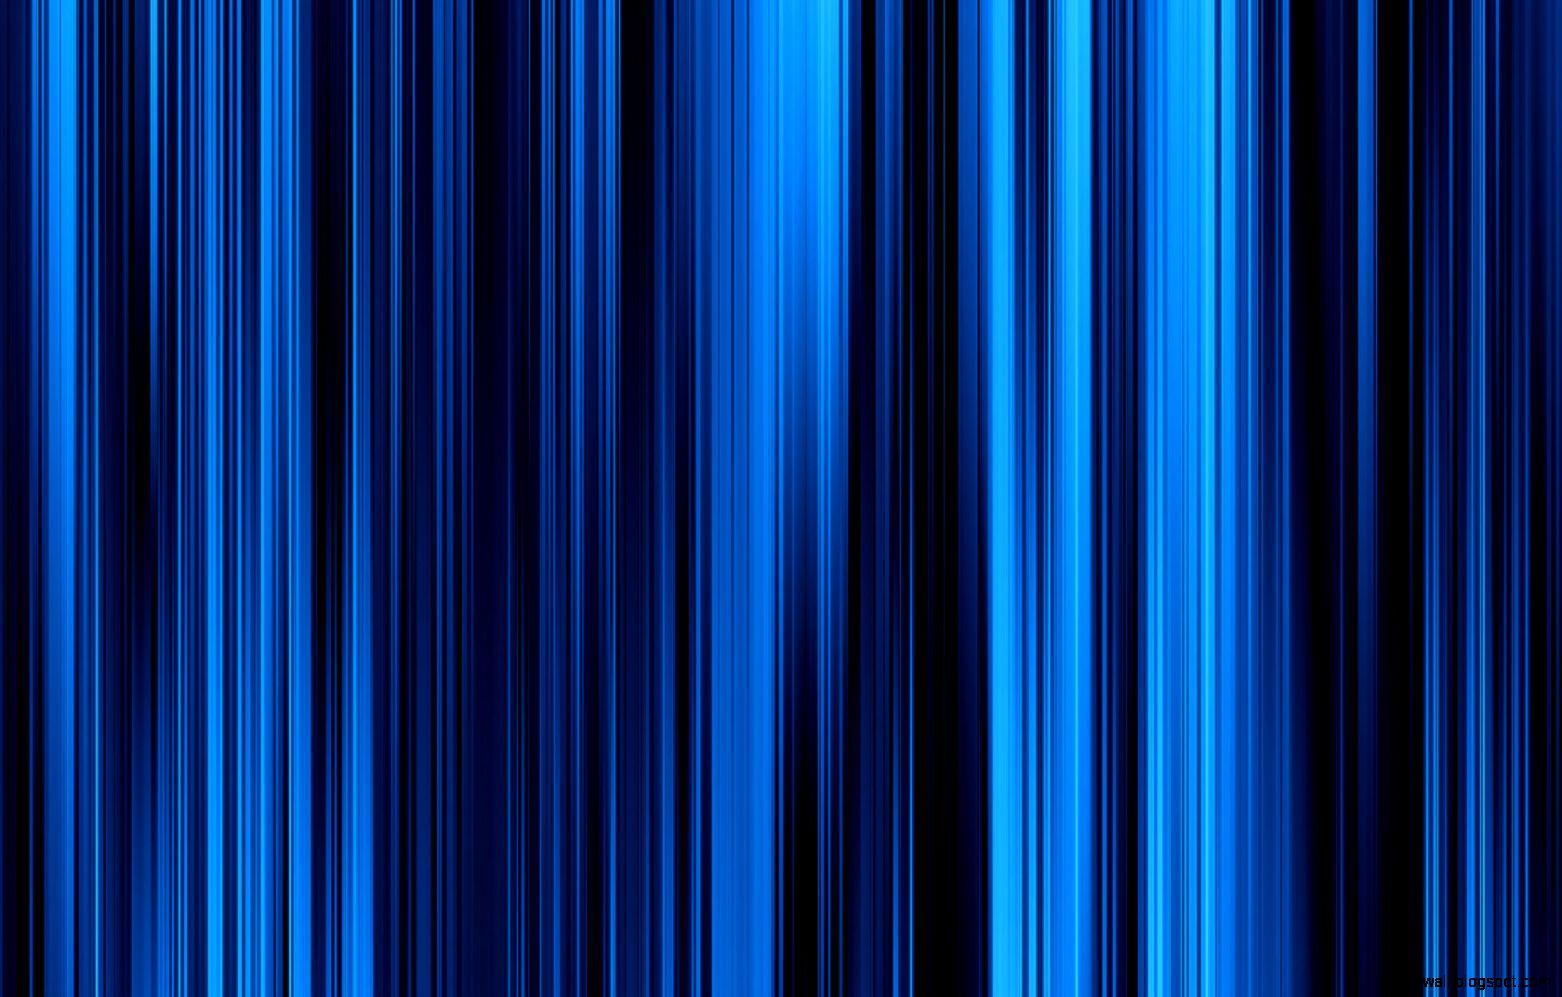 Blue Striped Wallpaper